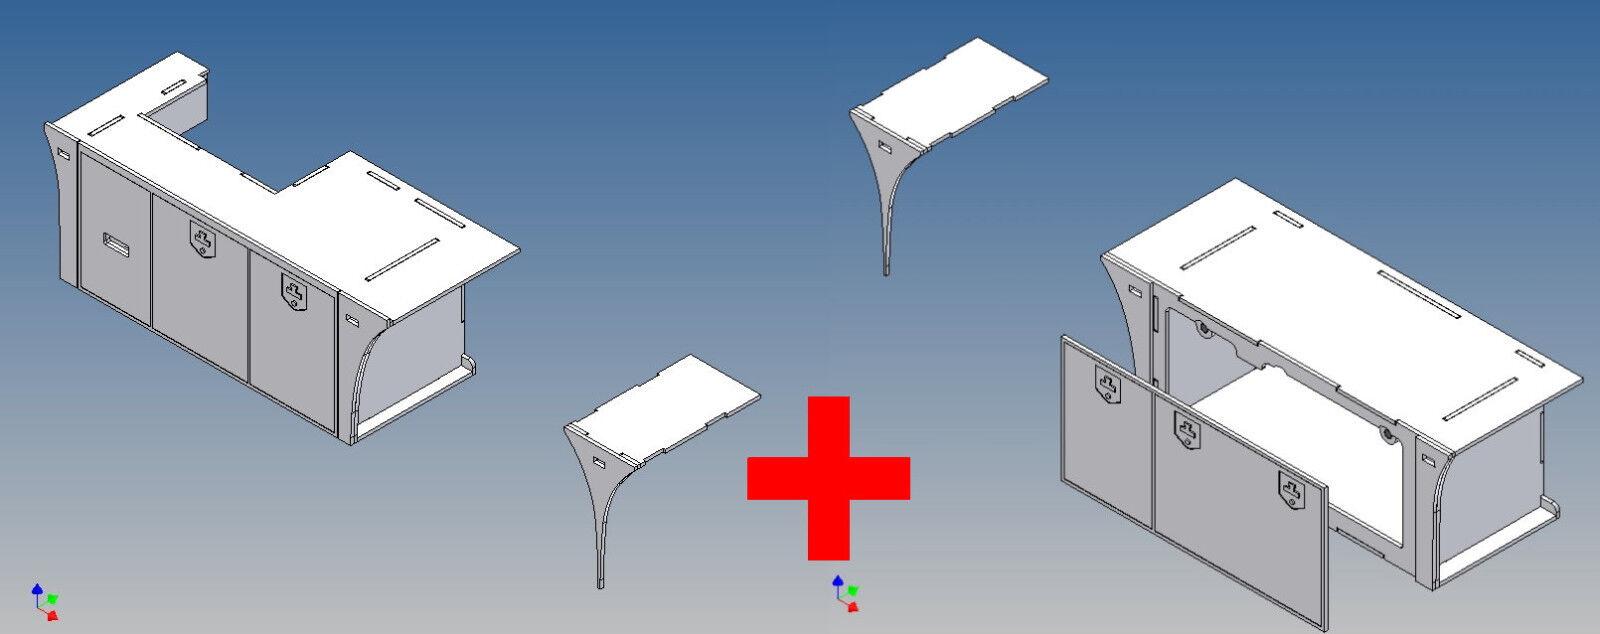 S3vr+ls - - - vollprofilstaukisten pour TAMIYA SCANIA 3-Achser m1:14 RE + li M. lenks c58216